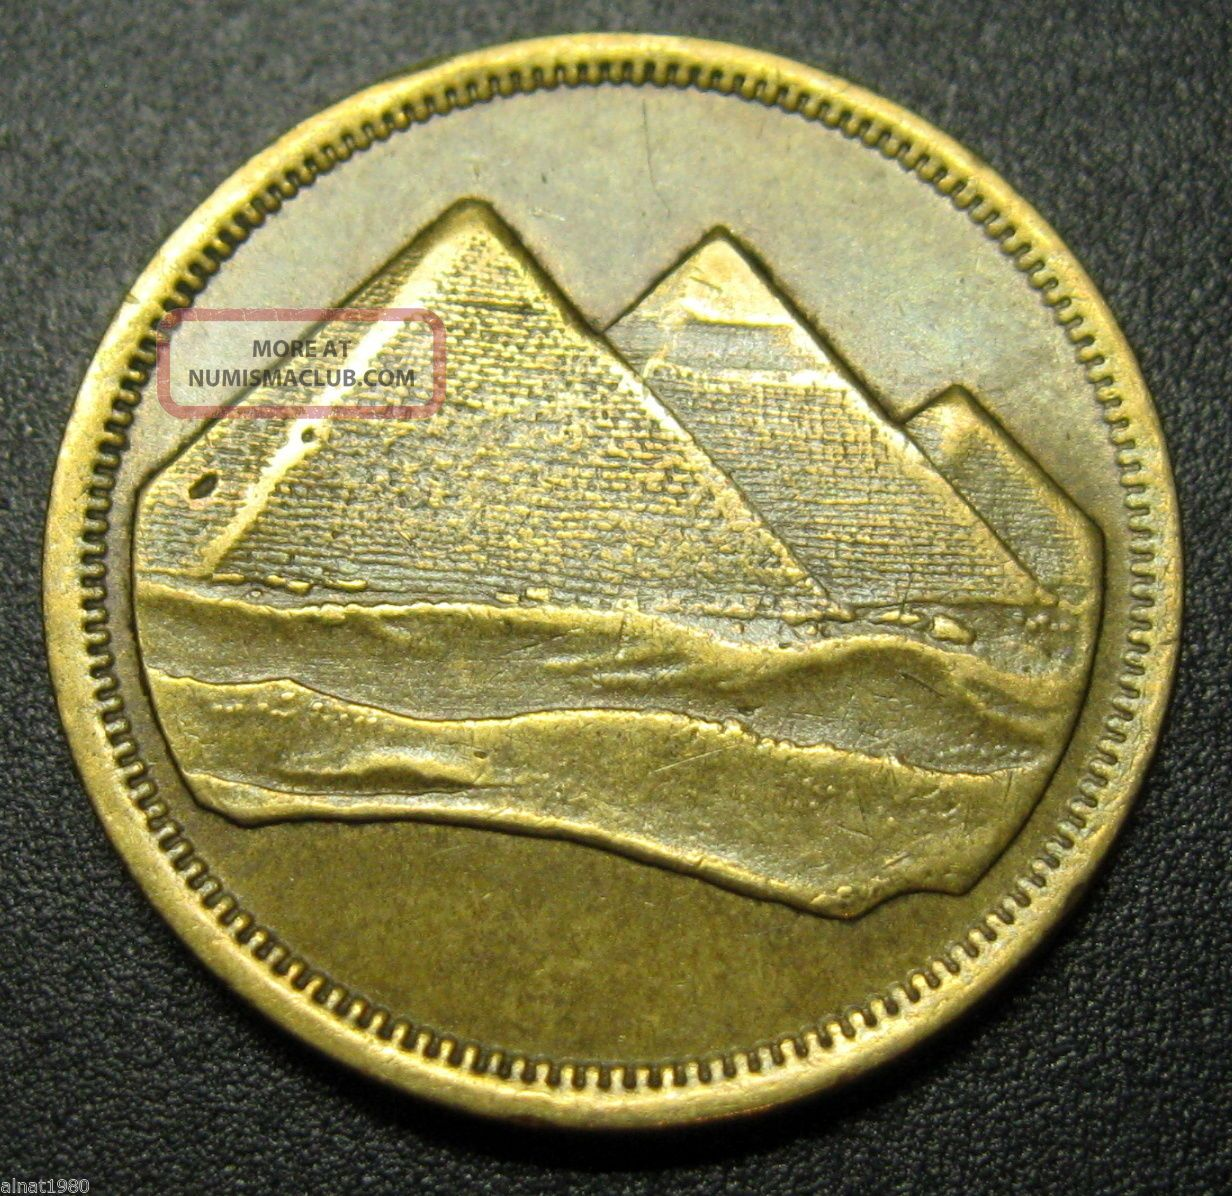 Egyptian Coins Piastres Egypt 5 Piastres Coin ah 1404